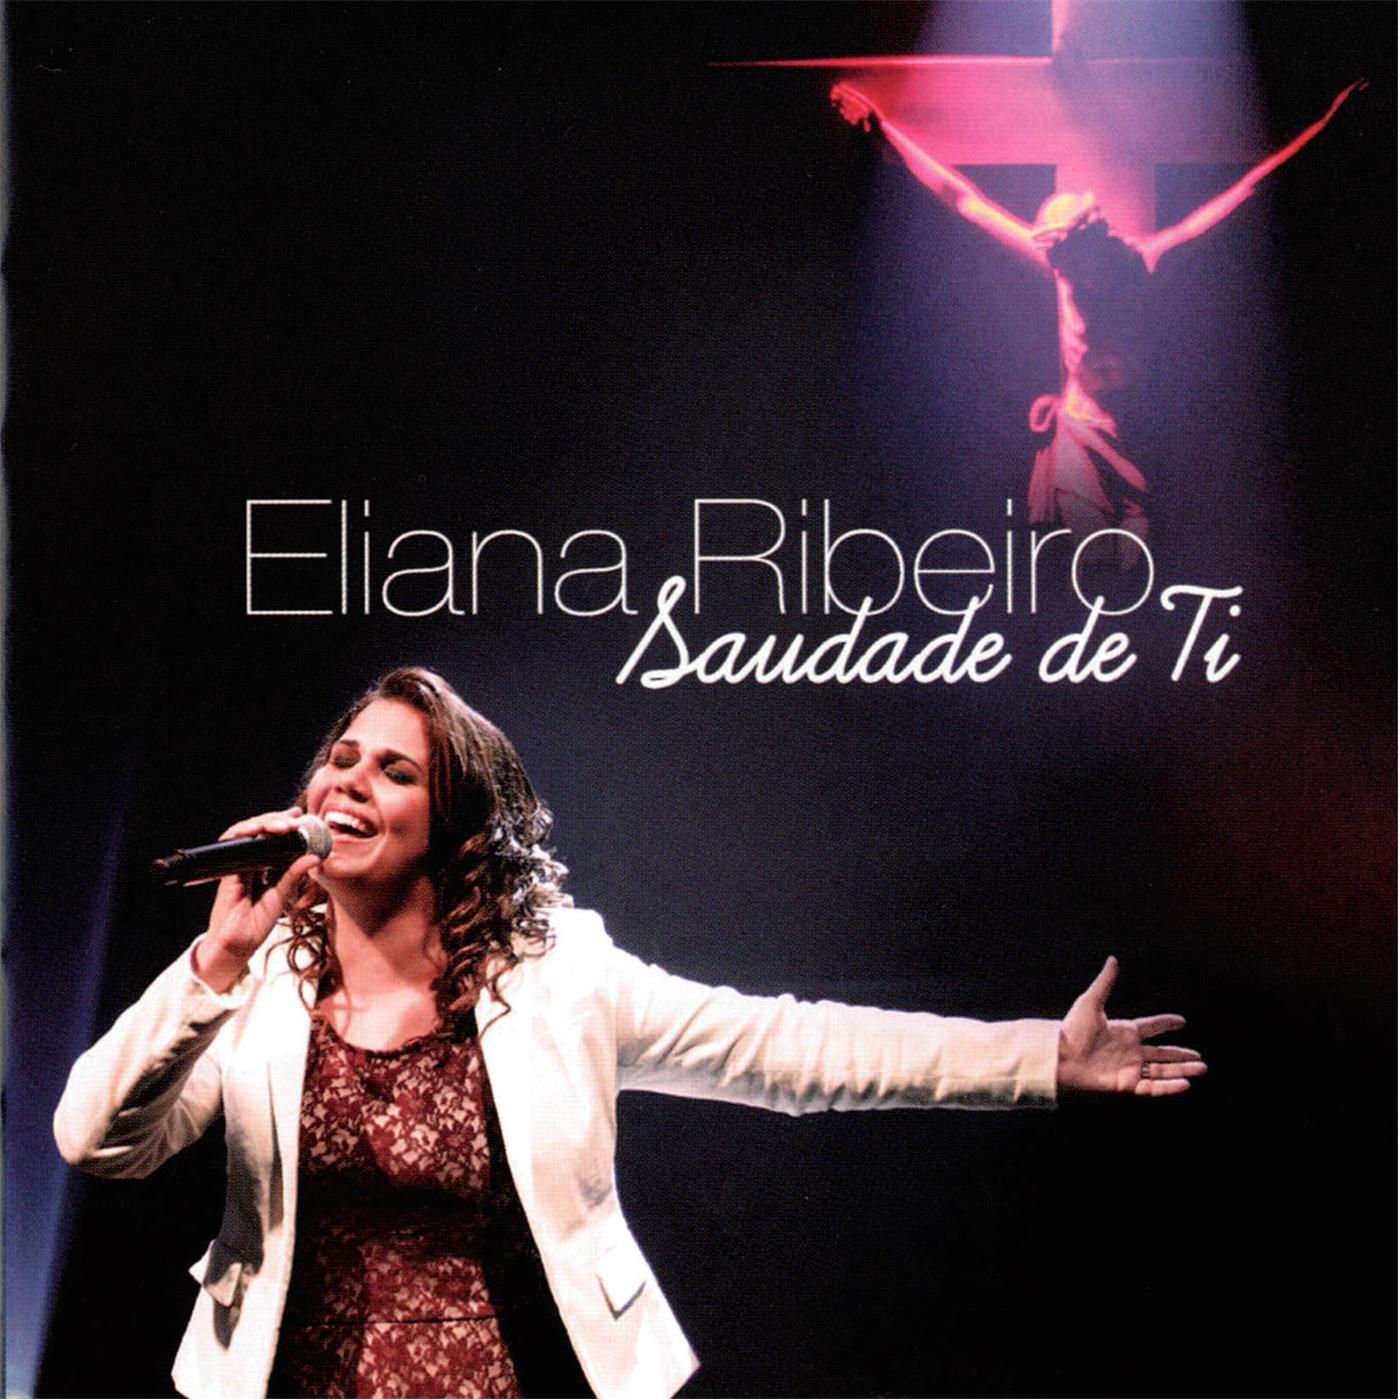 Saudade de Ti - Eliana Ribeiro